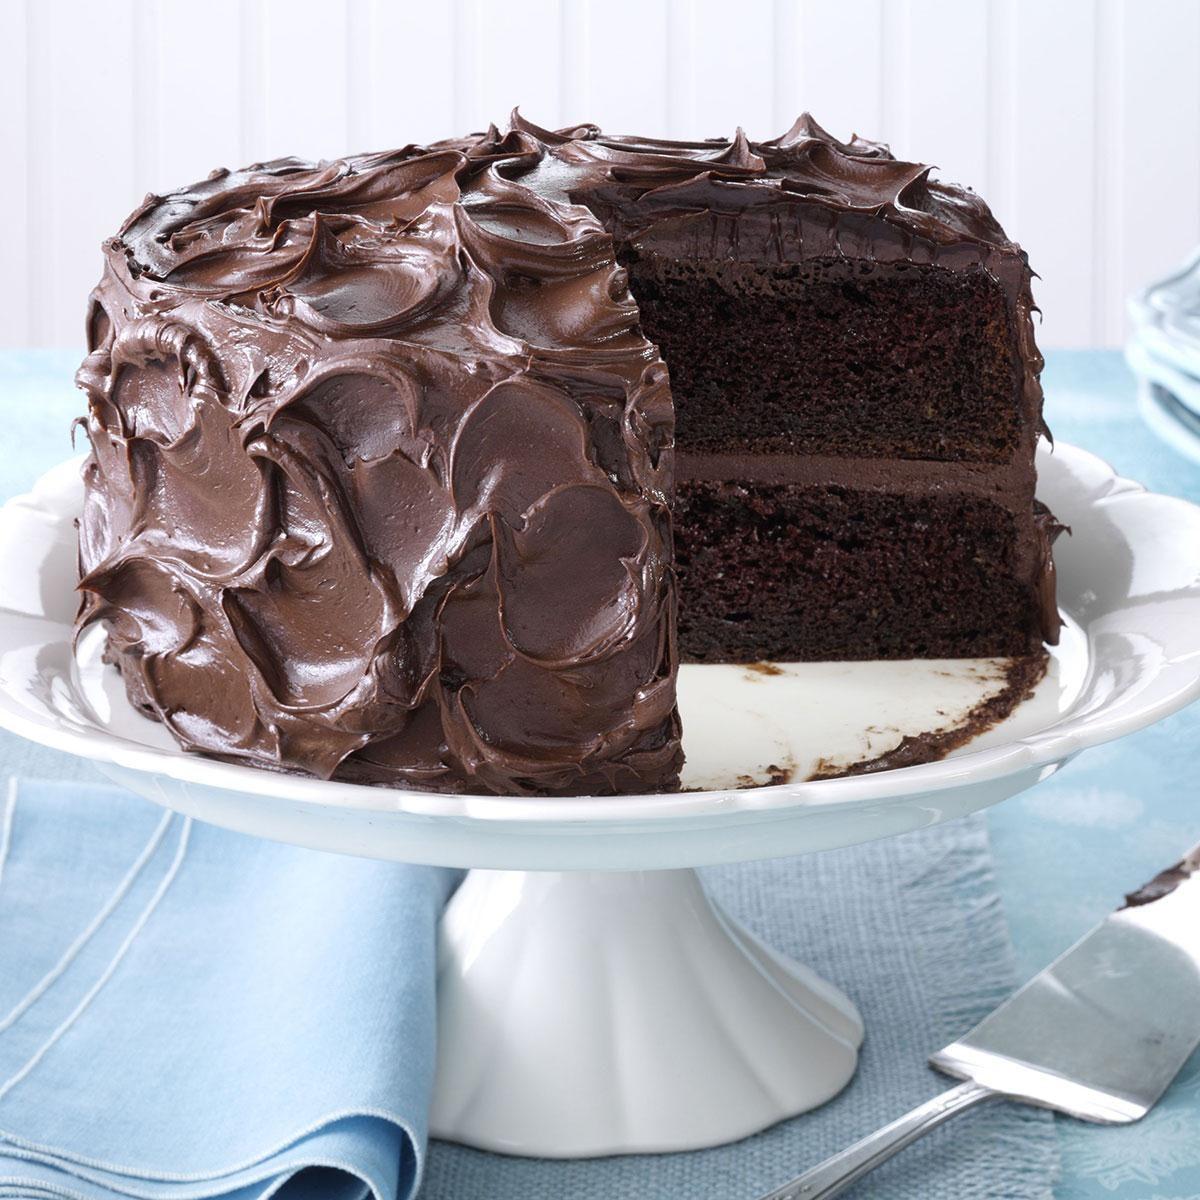 Come-Home-to-Mama Chocolate Cake Recipe